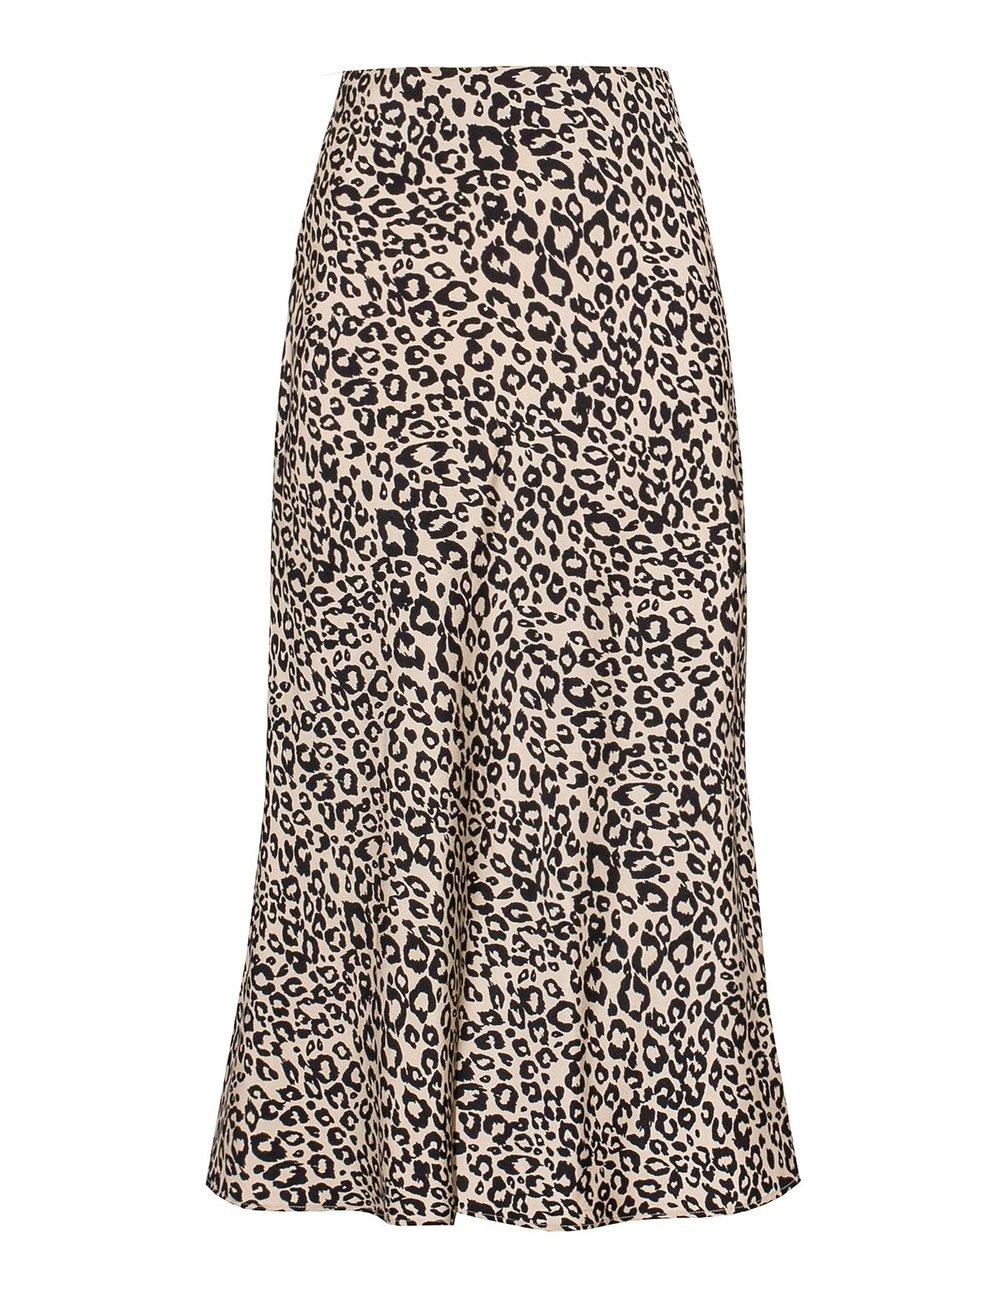 Pixie Market Silk Skirt